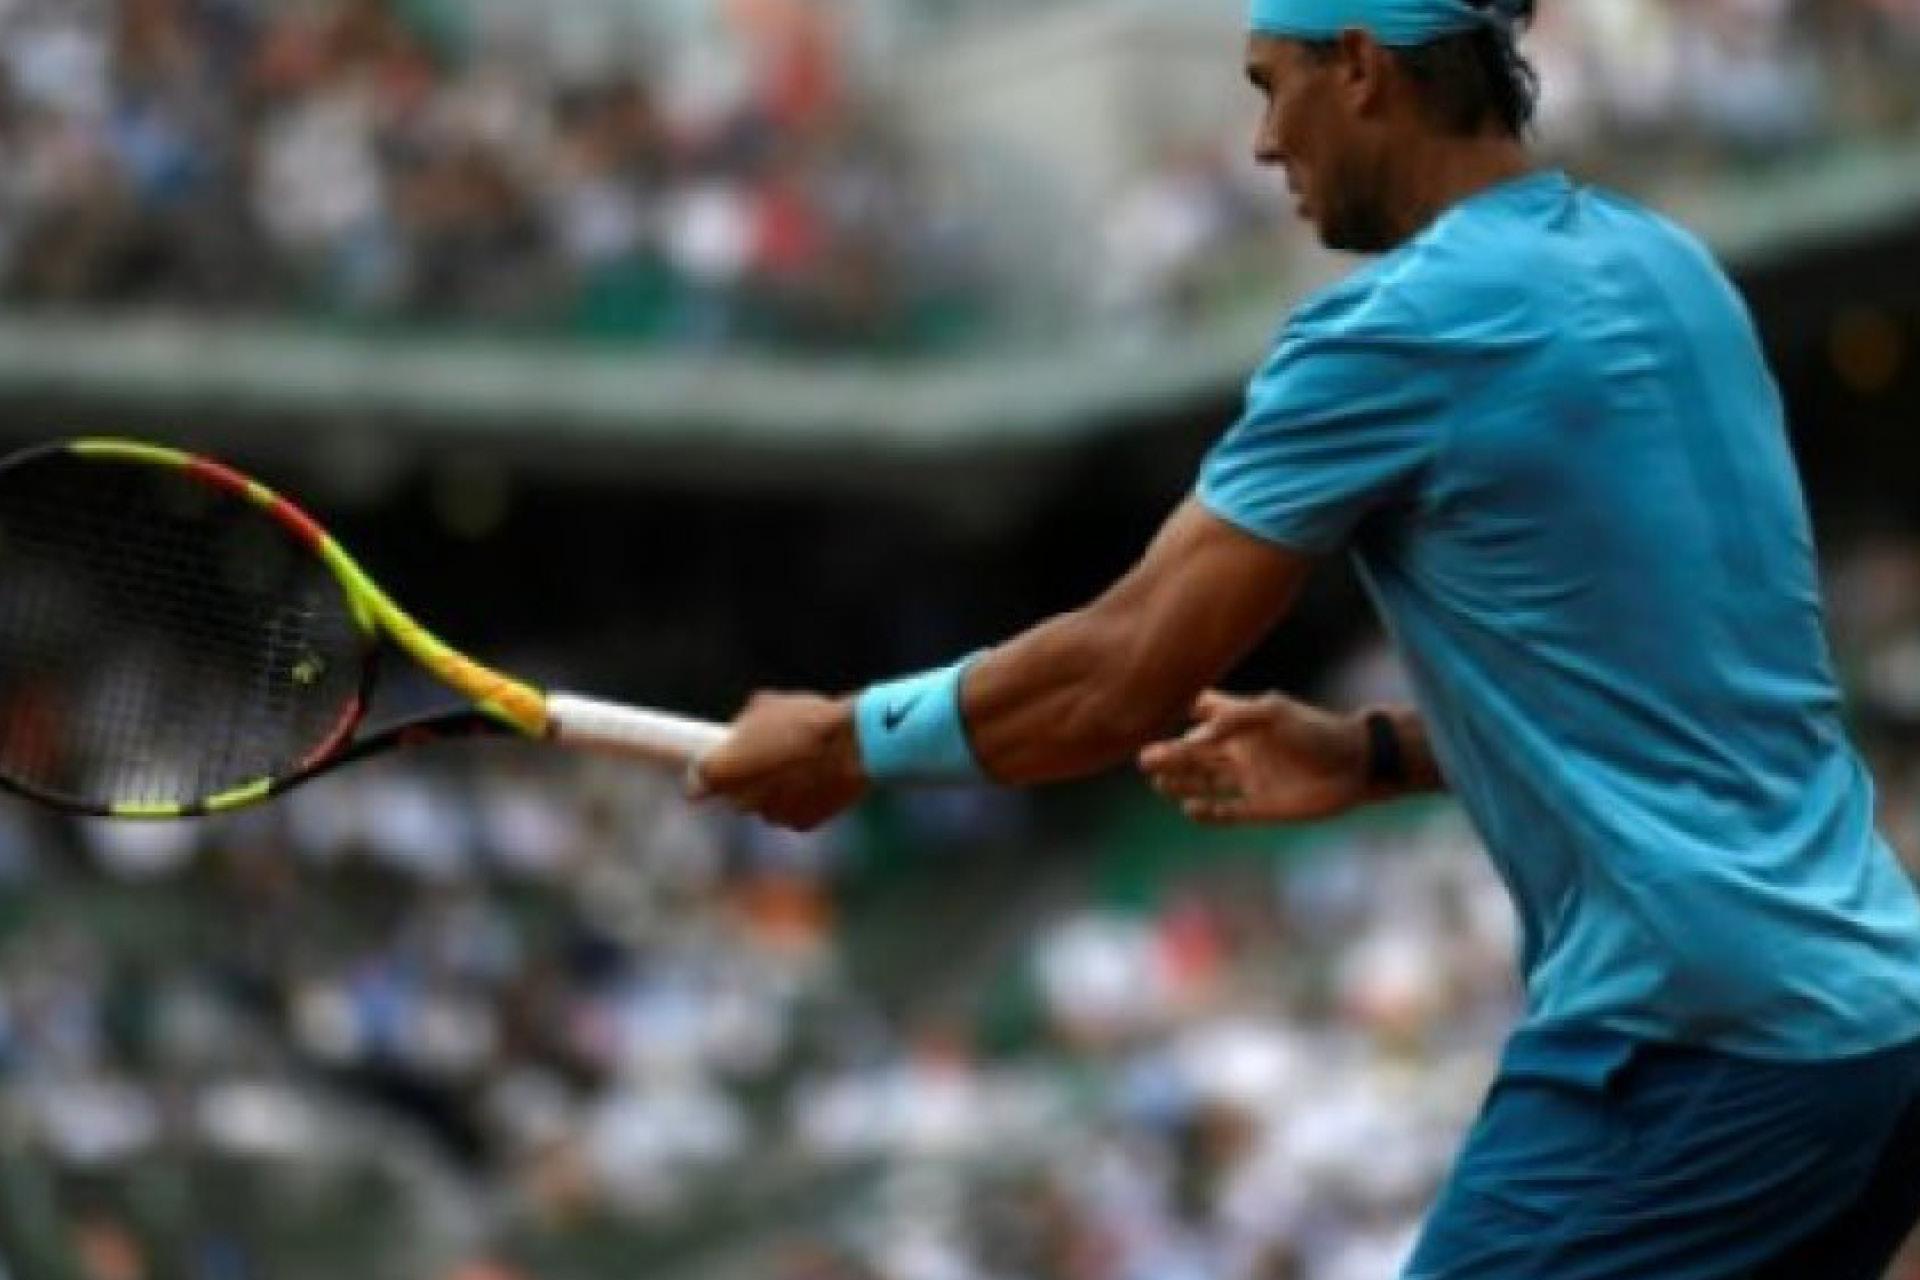 Roland Garros Images-5.jpg